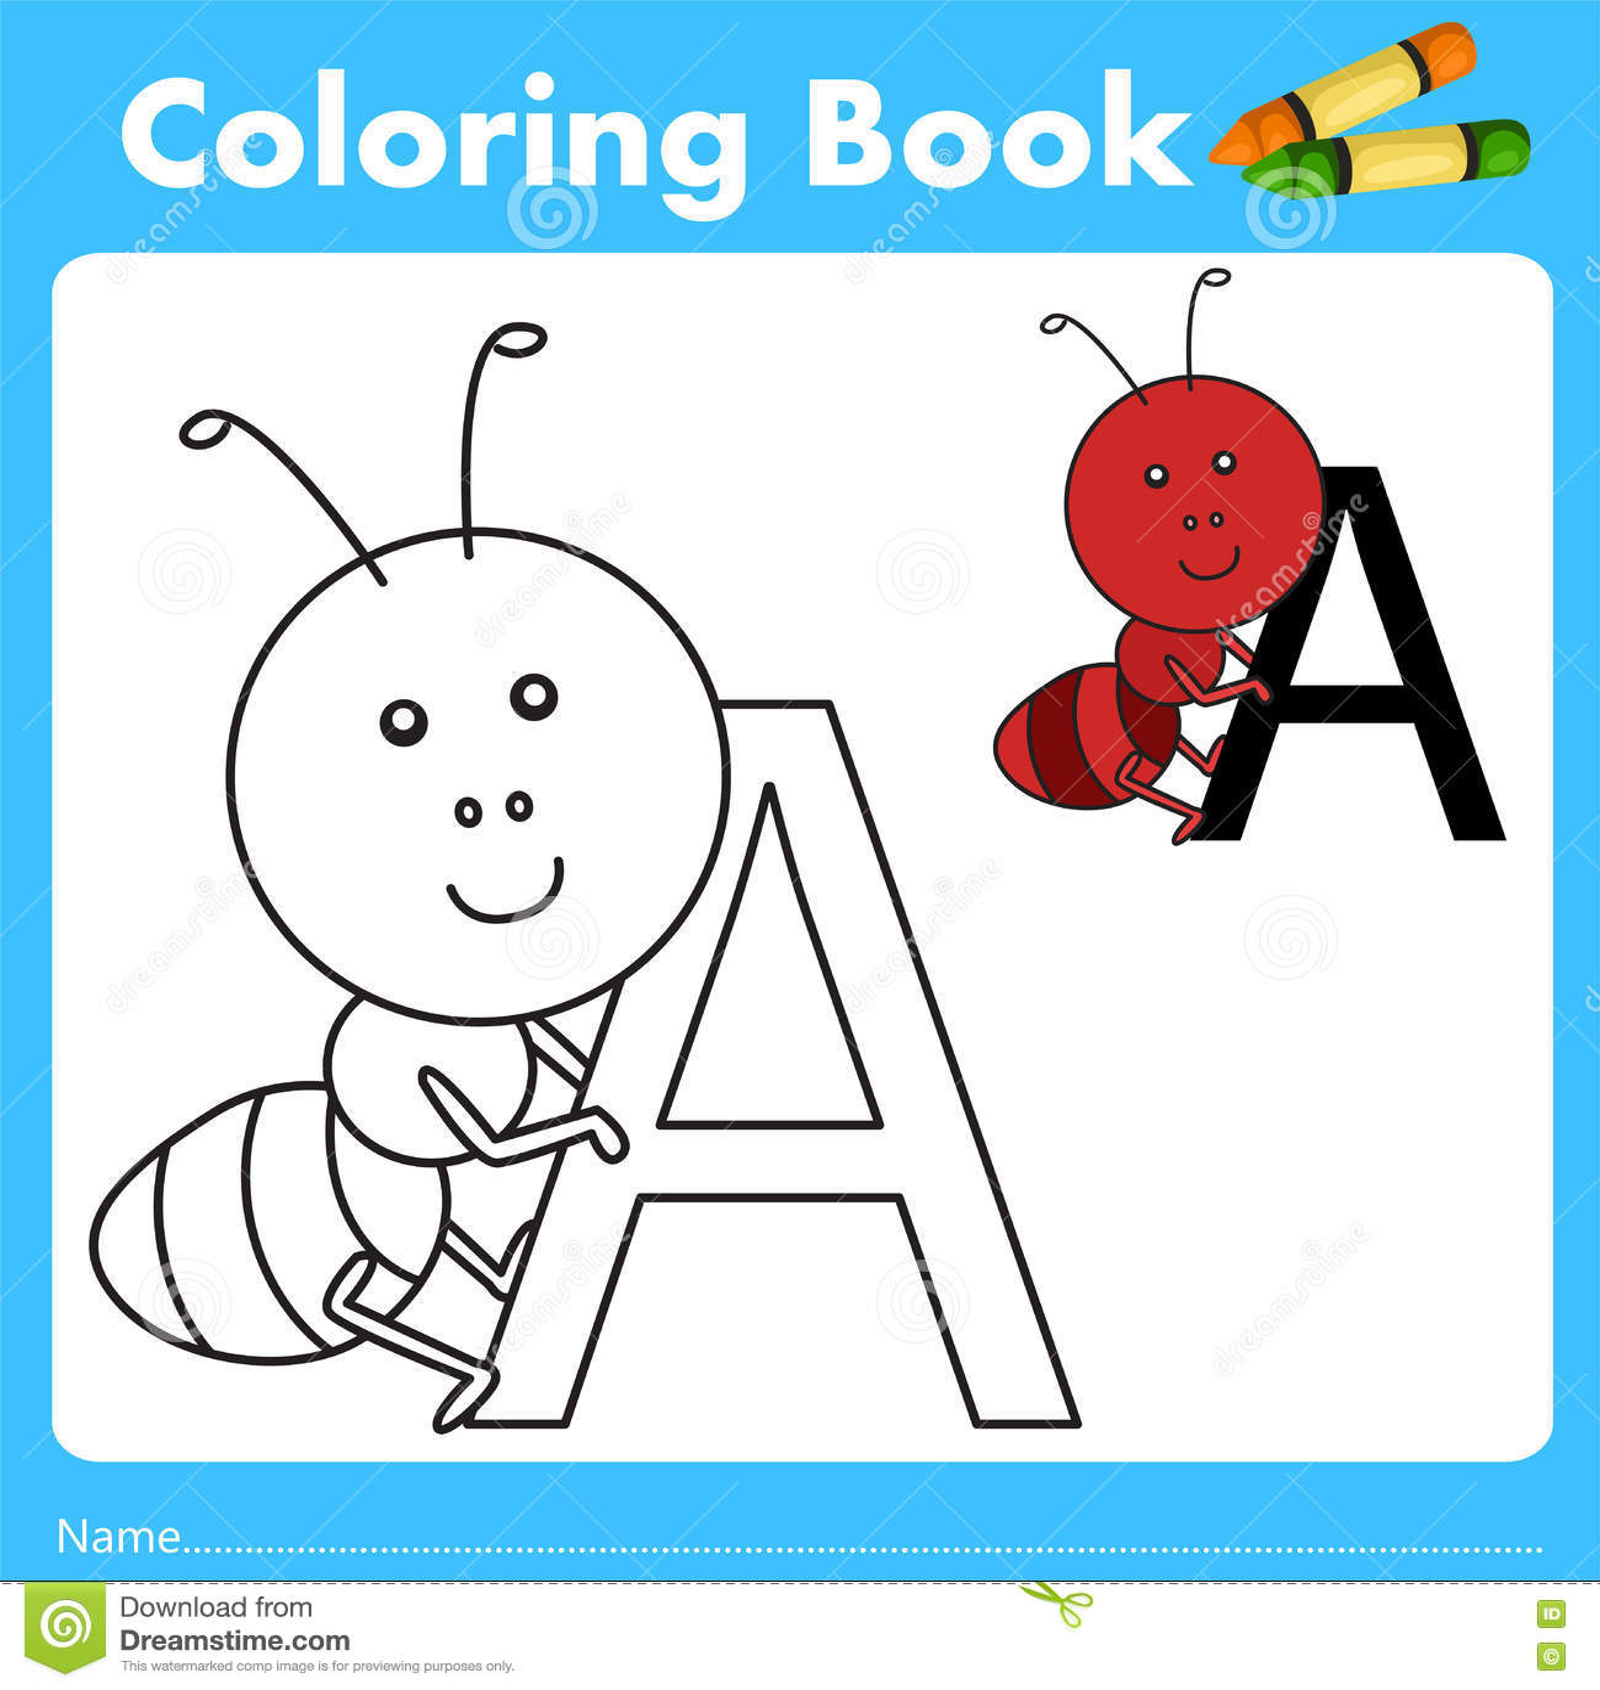 Book color illustrator - Animal Ant Book Color Education Illustrator